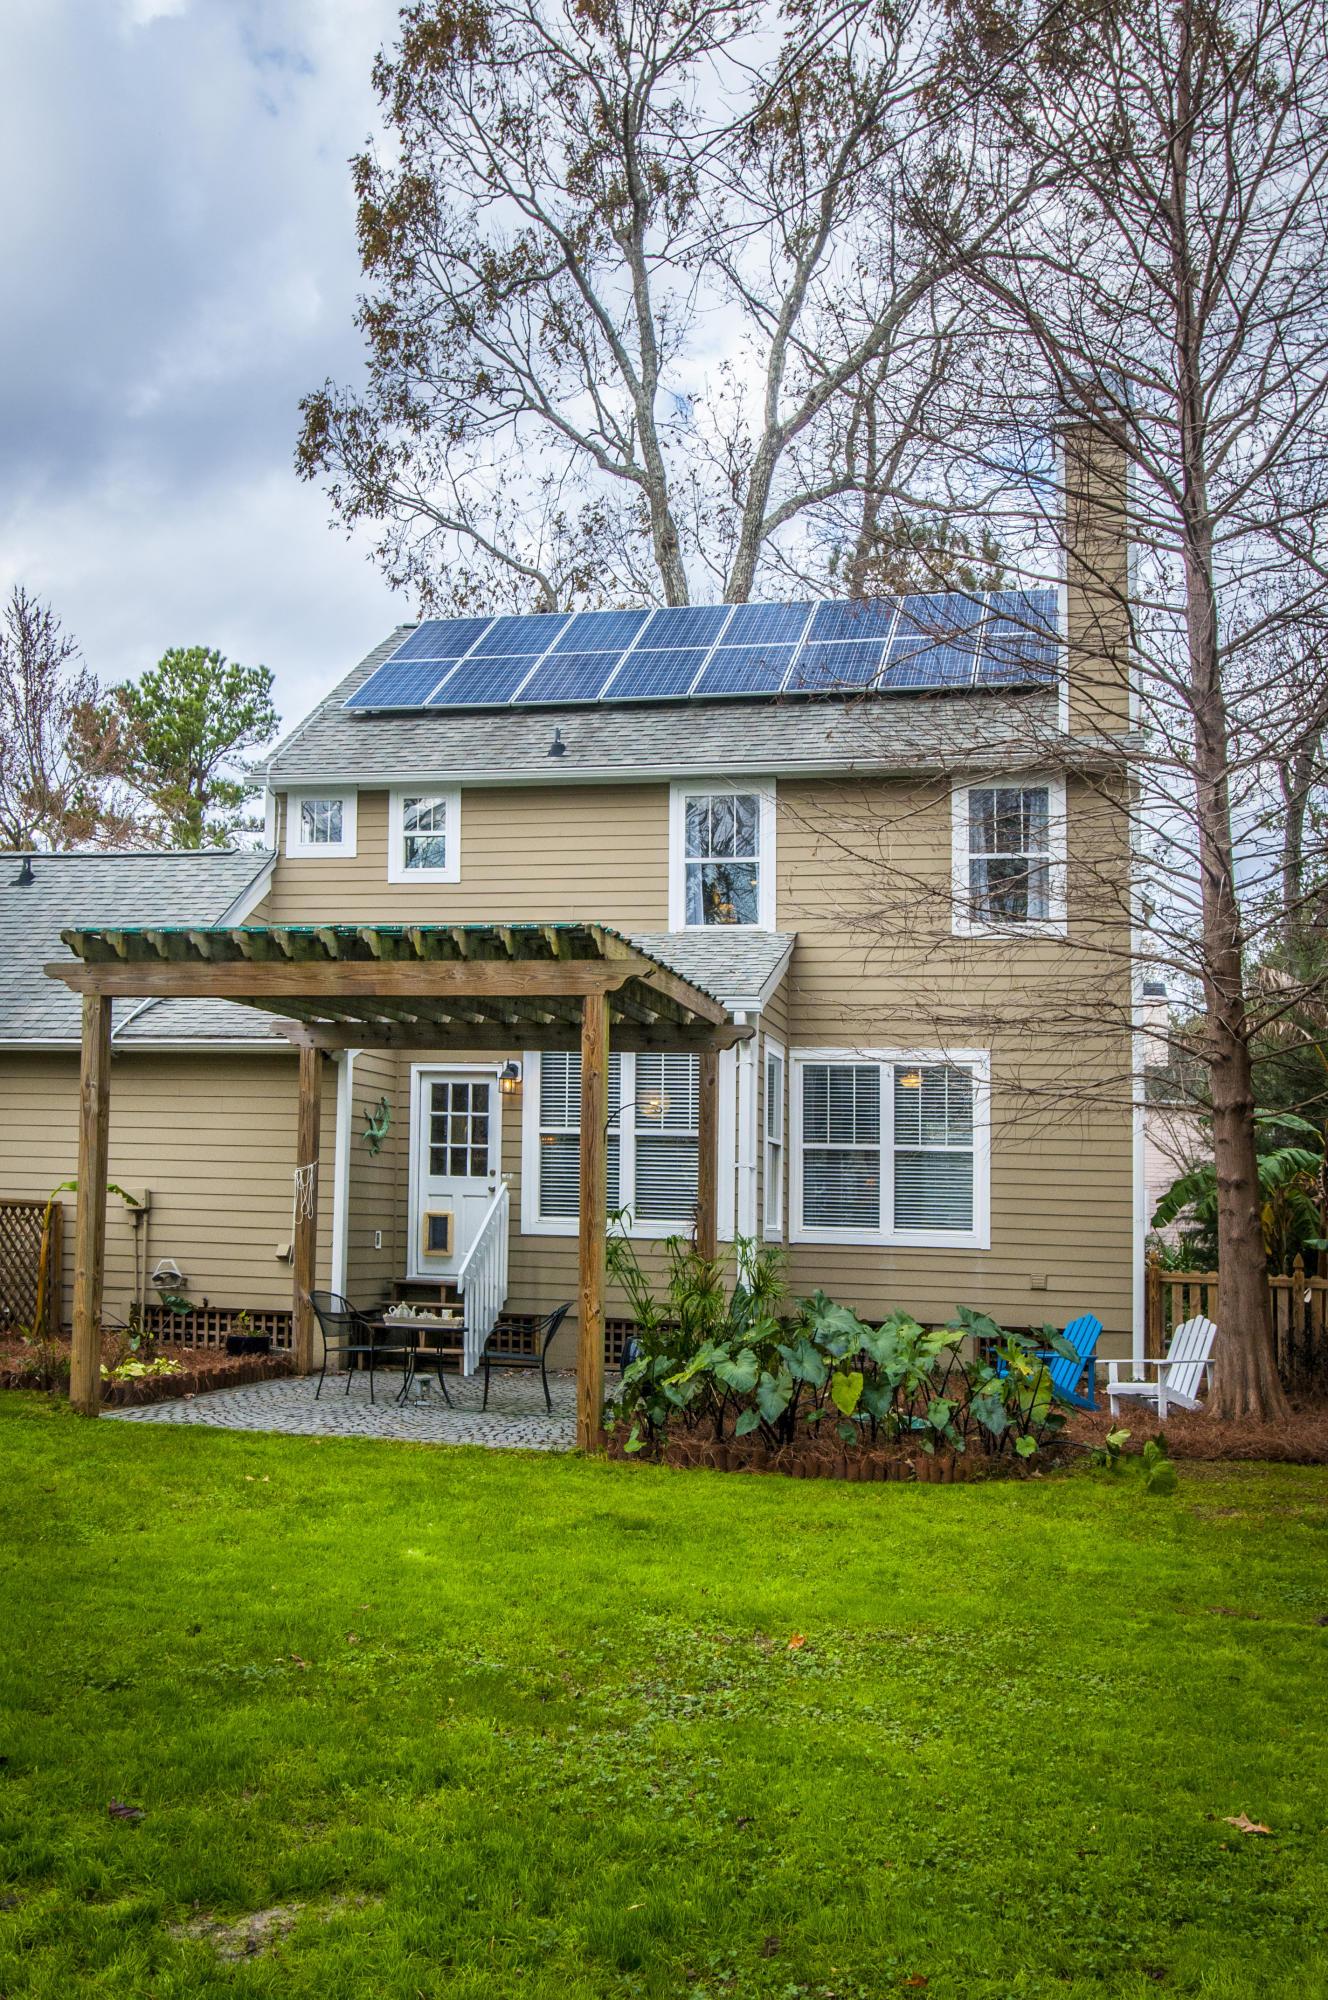 Etiwan Park Homes For Sale - 115 Brady, Daniel Island, SC - 28